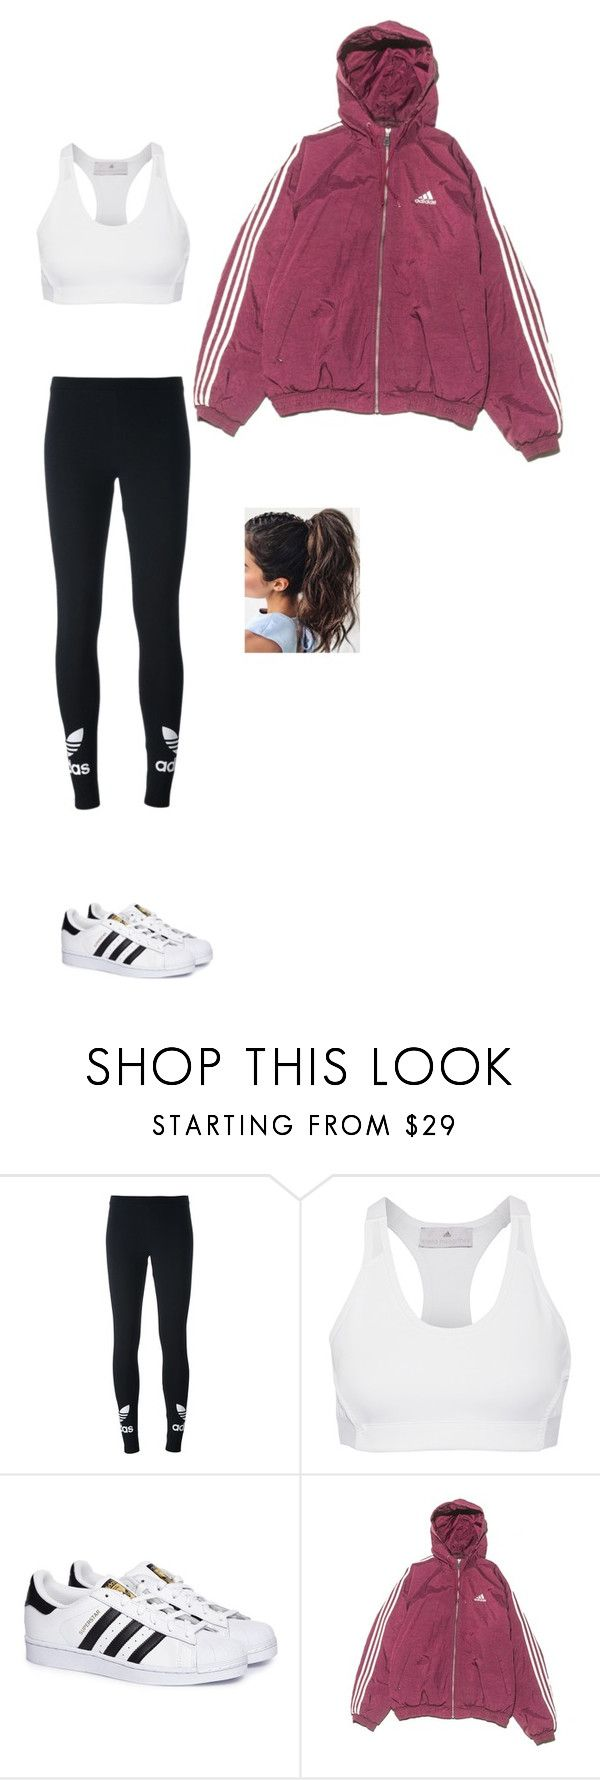 """Adidas"" by ericanunes on Polyvore featuring adidas Originals and adidas"